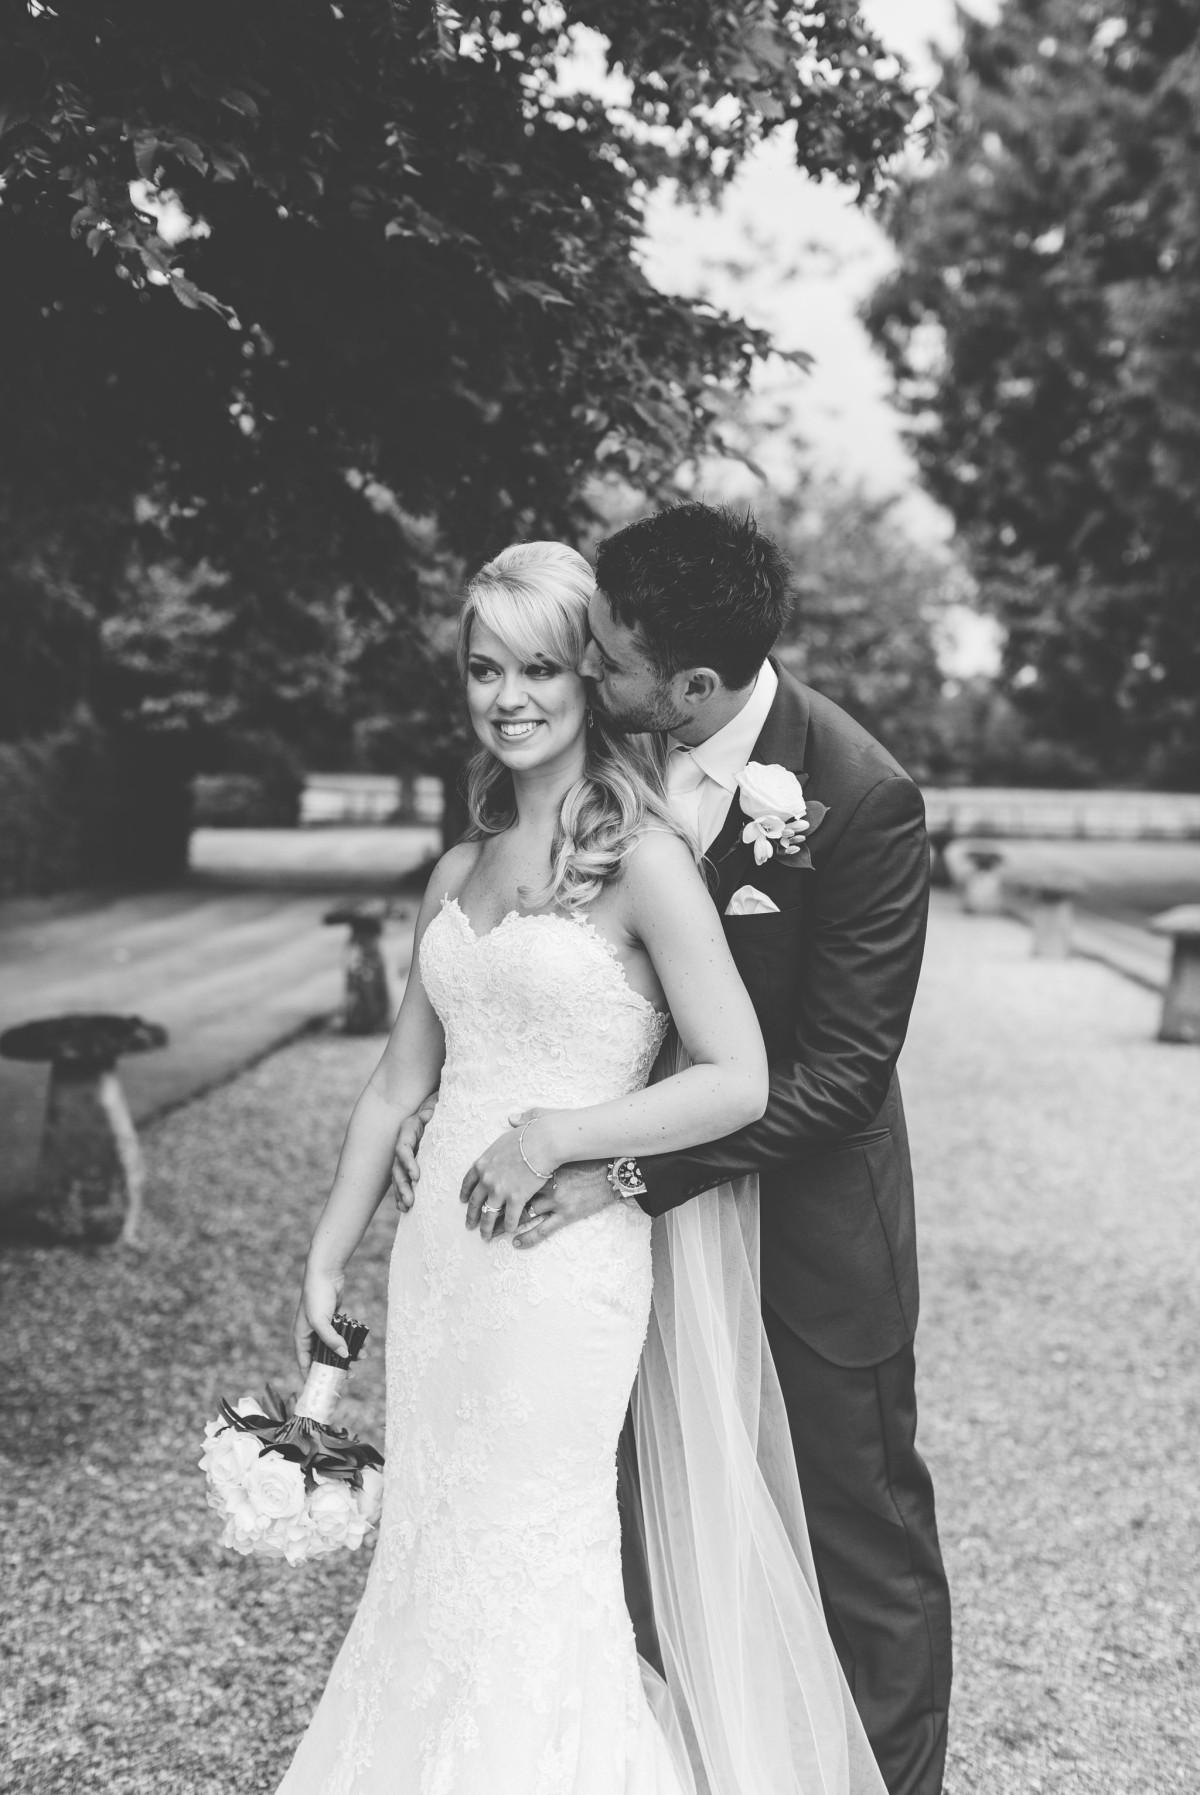 welsh_wedding_photographer_rachel_lambert_photography_lower_slaughter_manor_house_cotswolds_harriet_dean_ 33